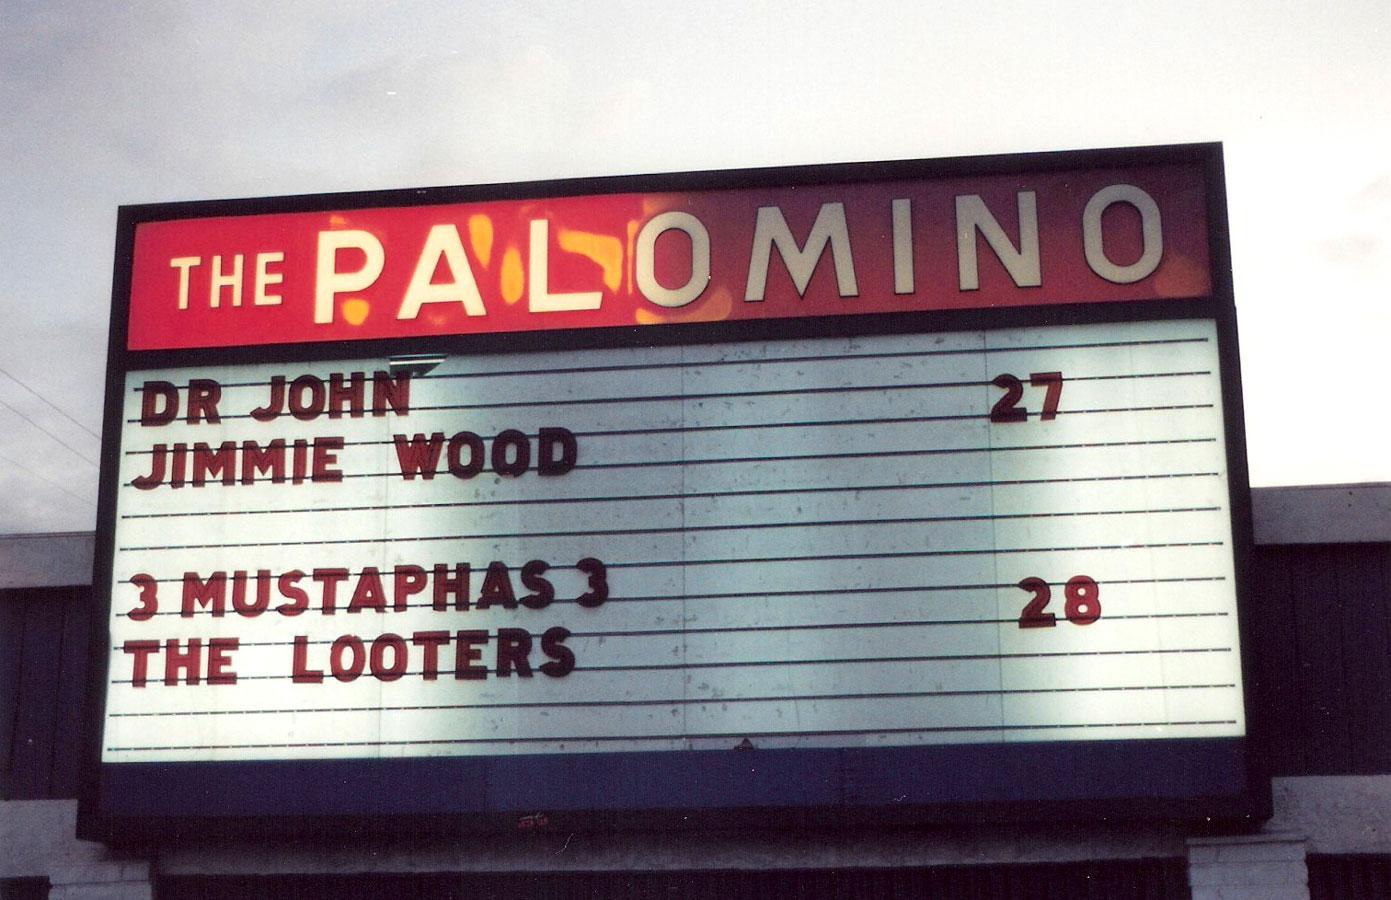 3 Mustaphas 3 at the Palomino